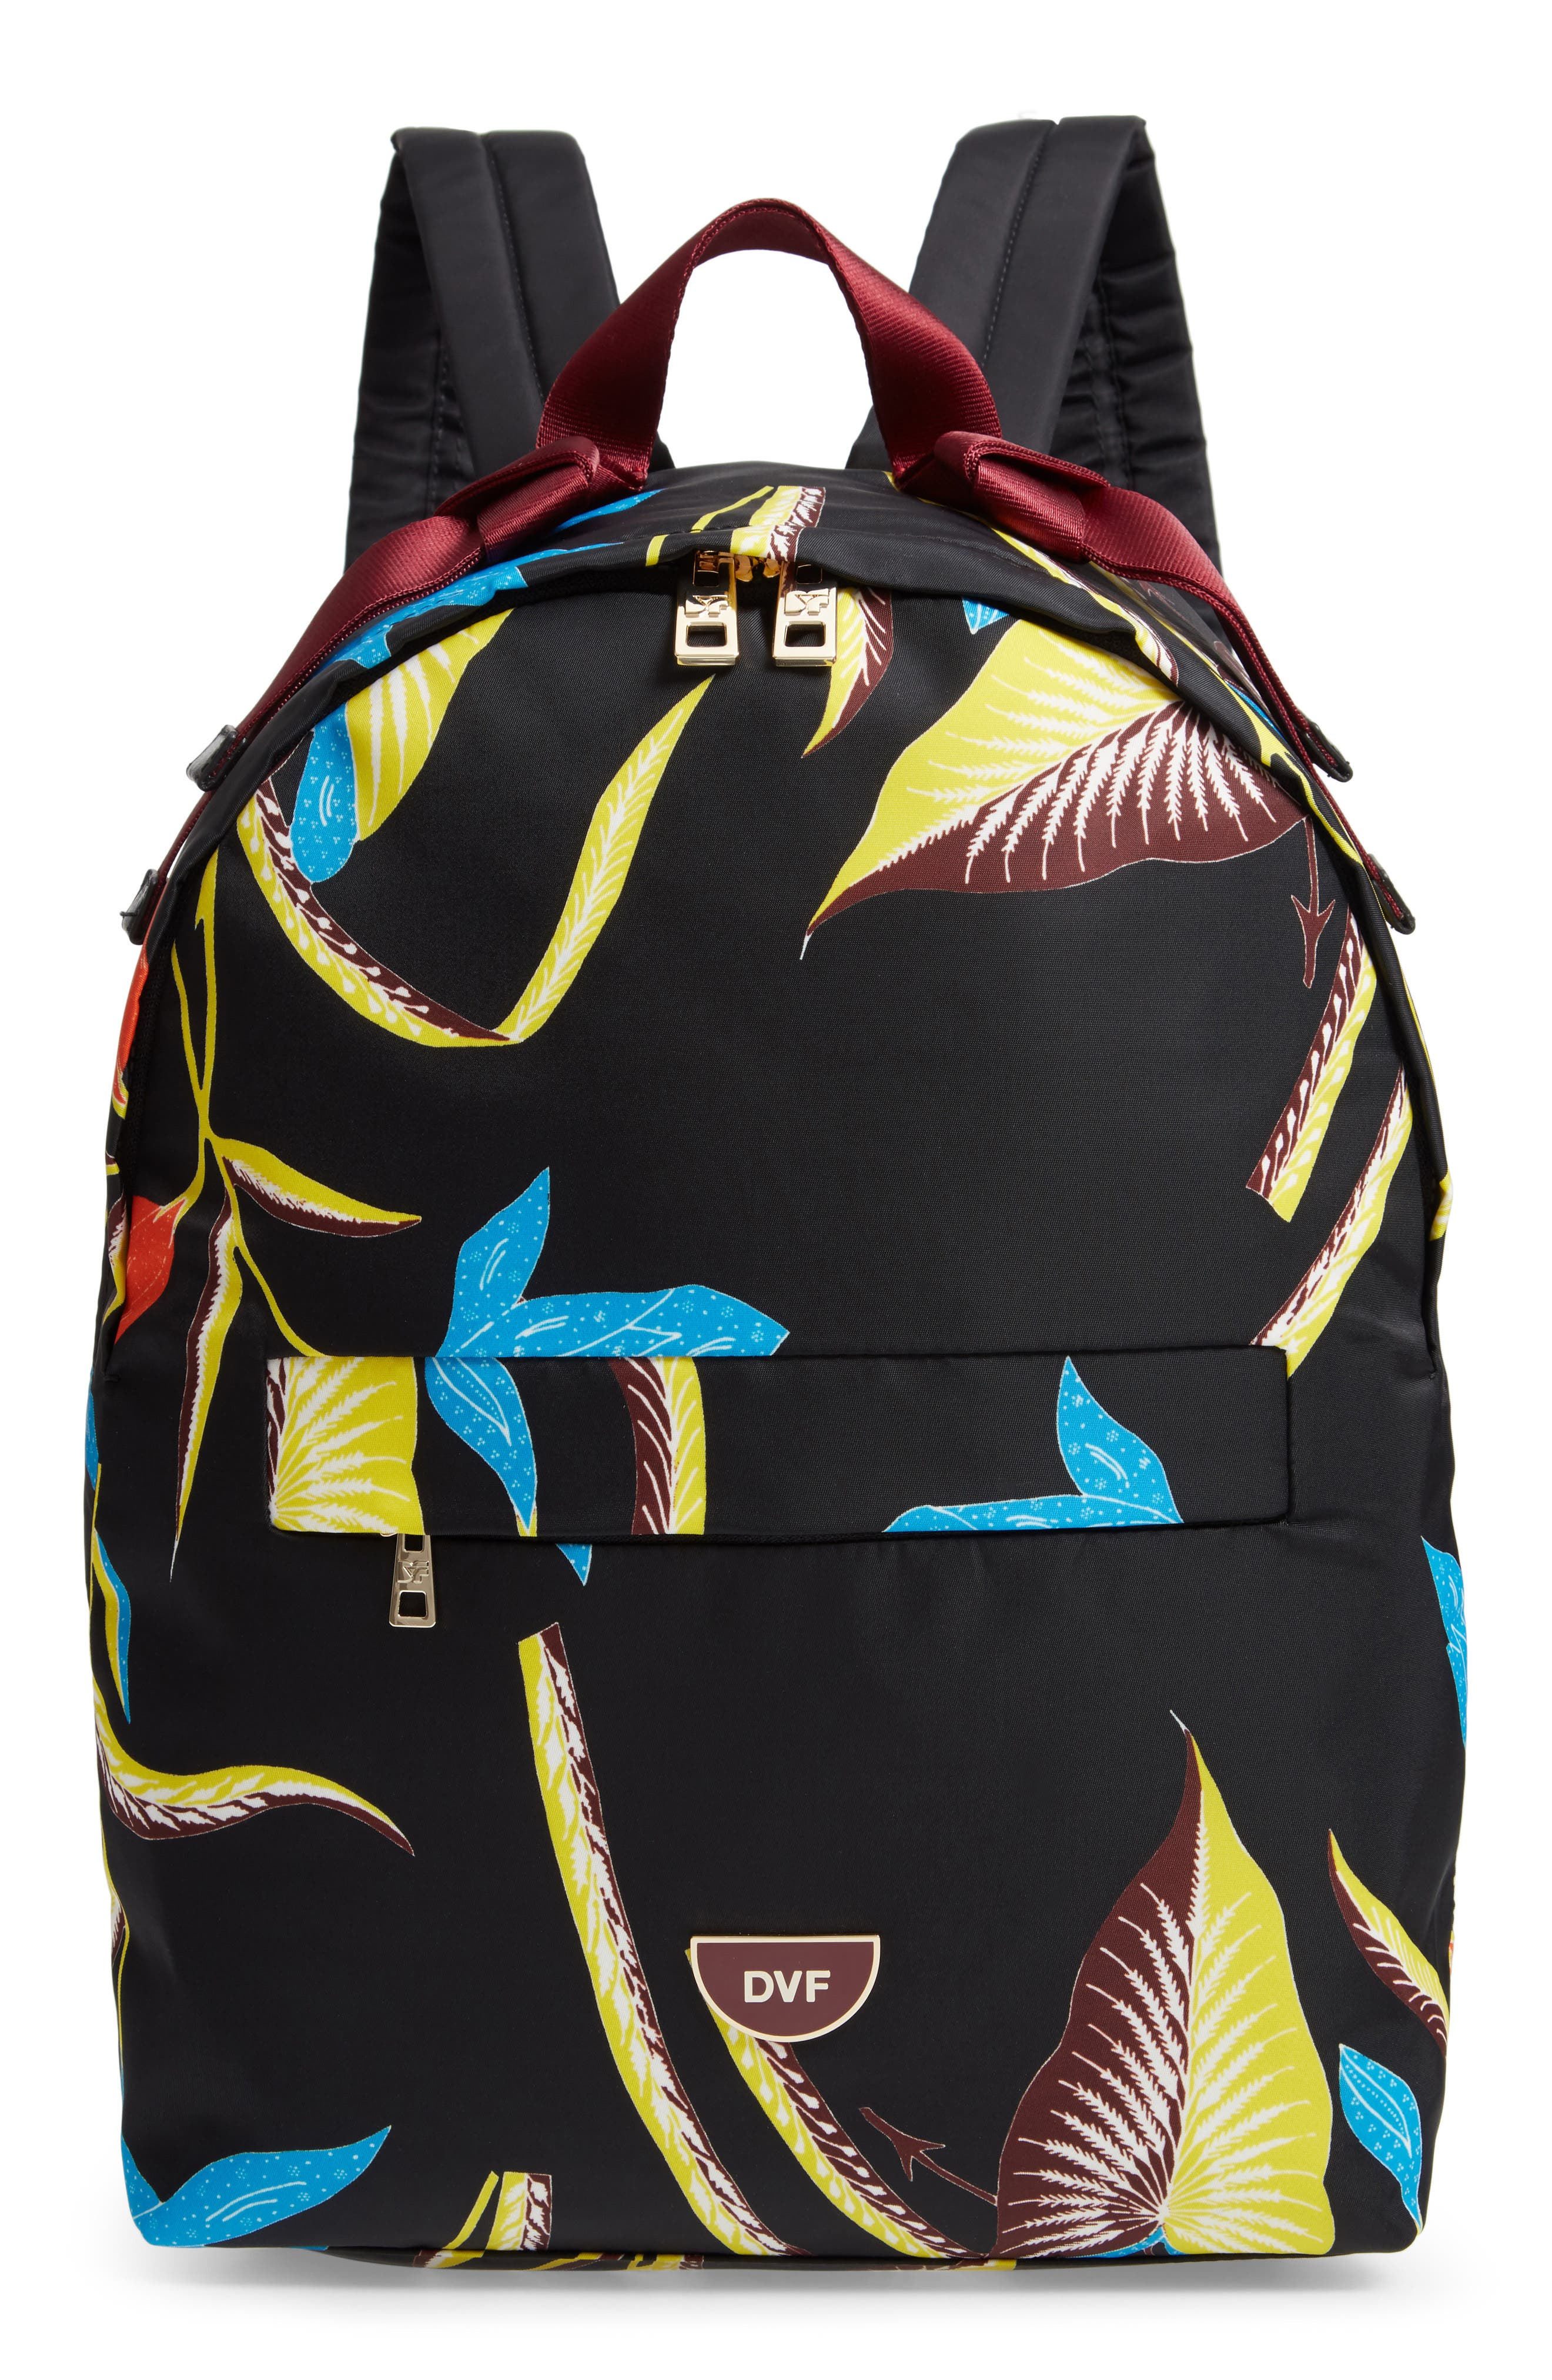 DVF Print Nylon Backpack,                             Main thumbnail 1, color,                             OSWALD BLACK